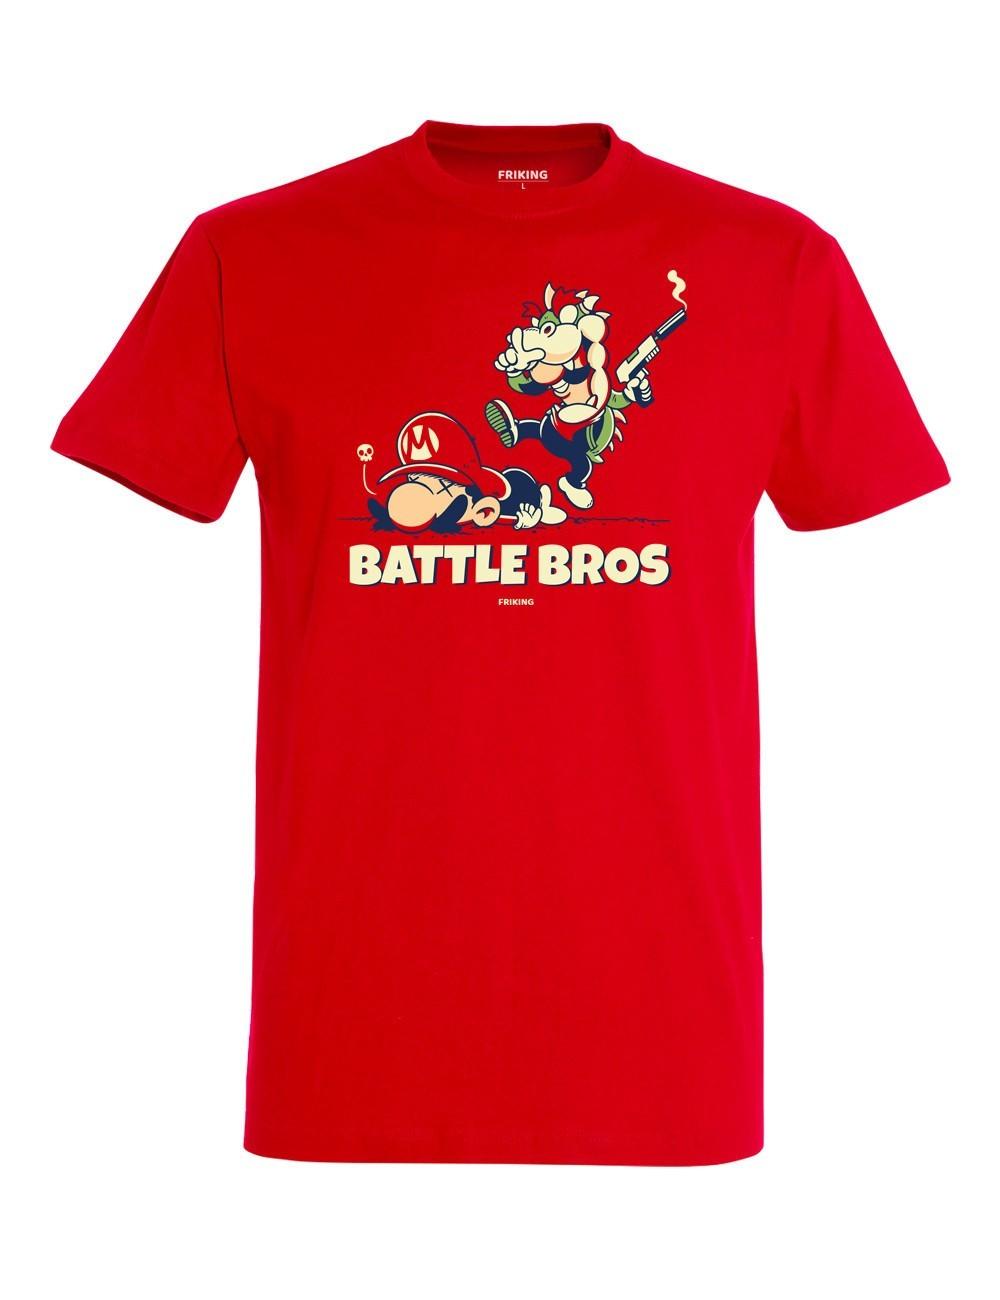 Battle bros